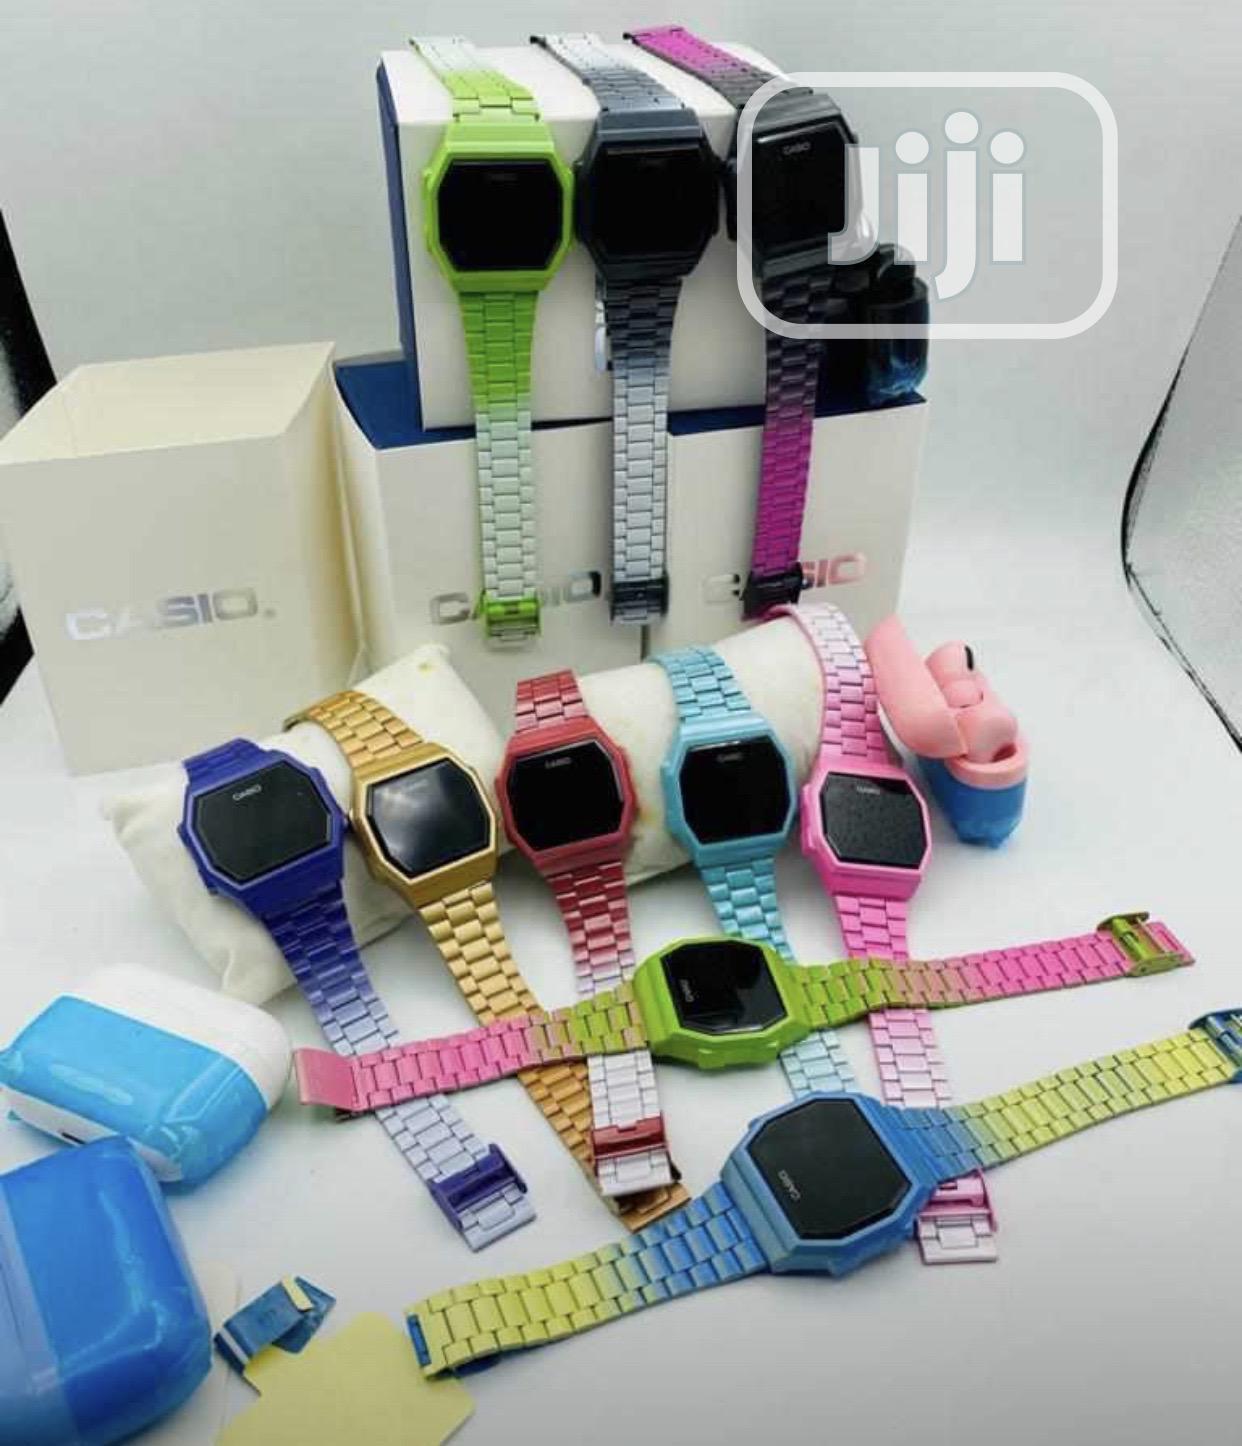 Ombre Casio Wristwatch